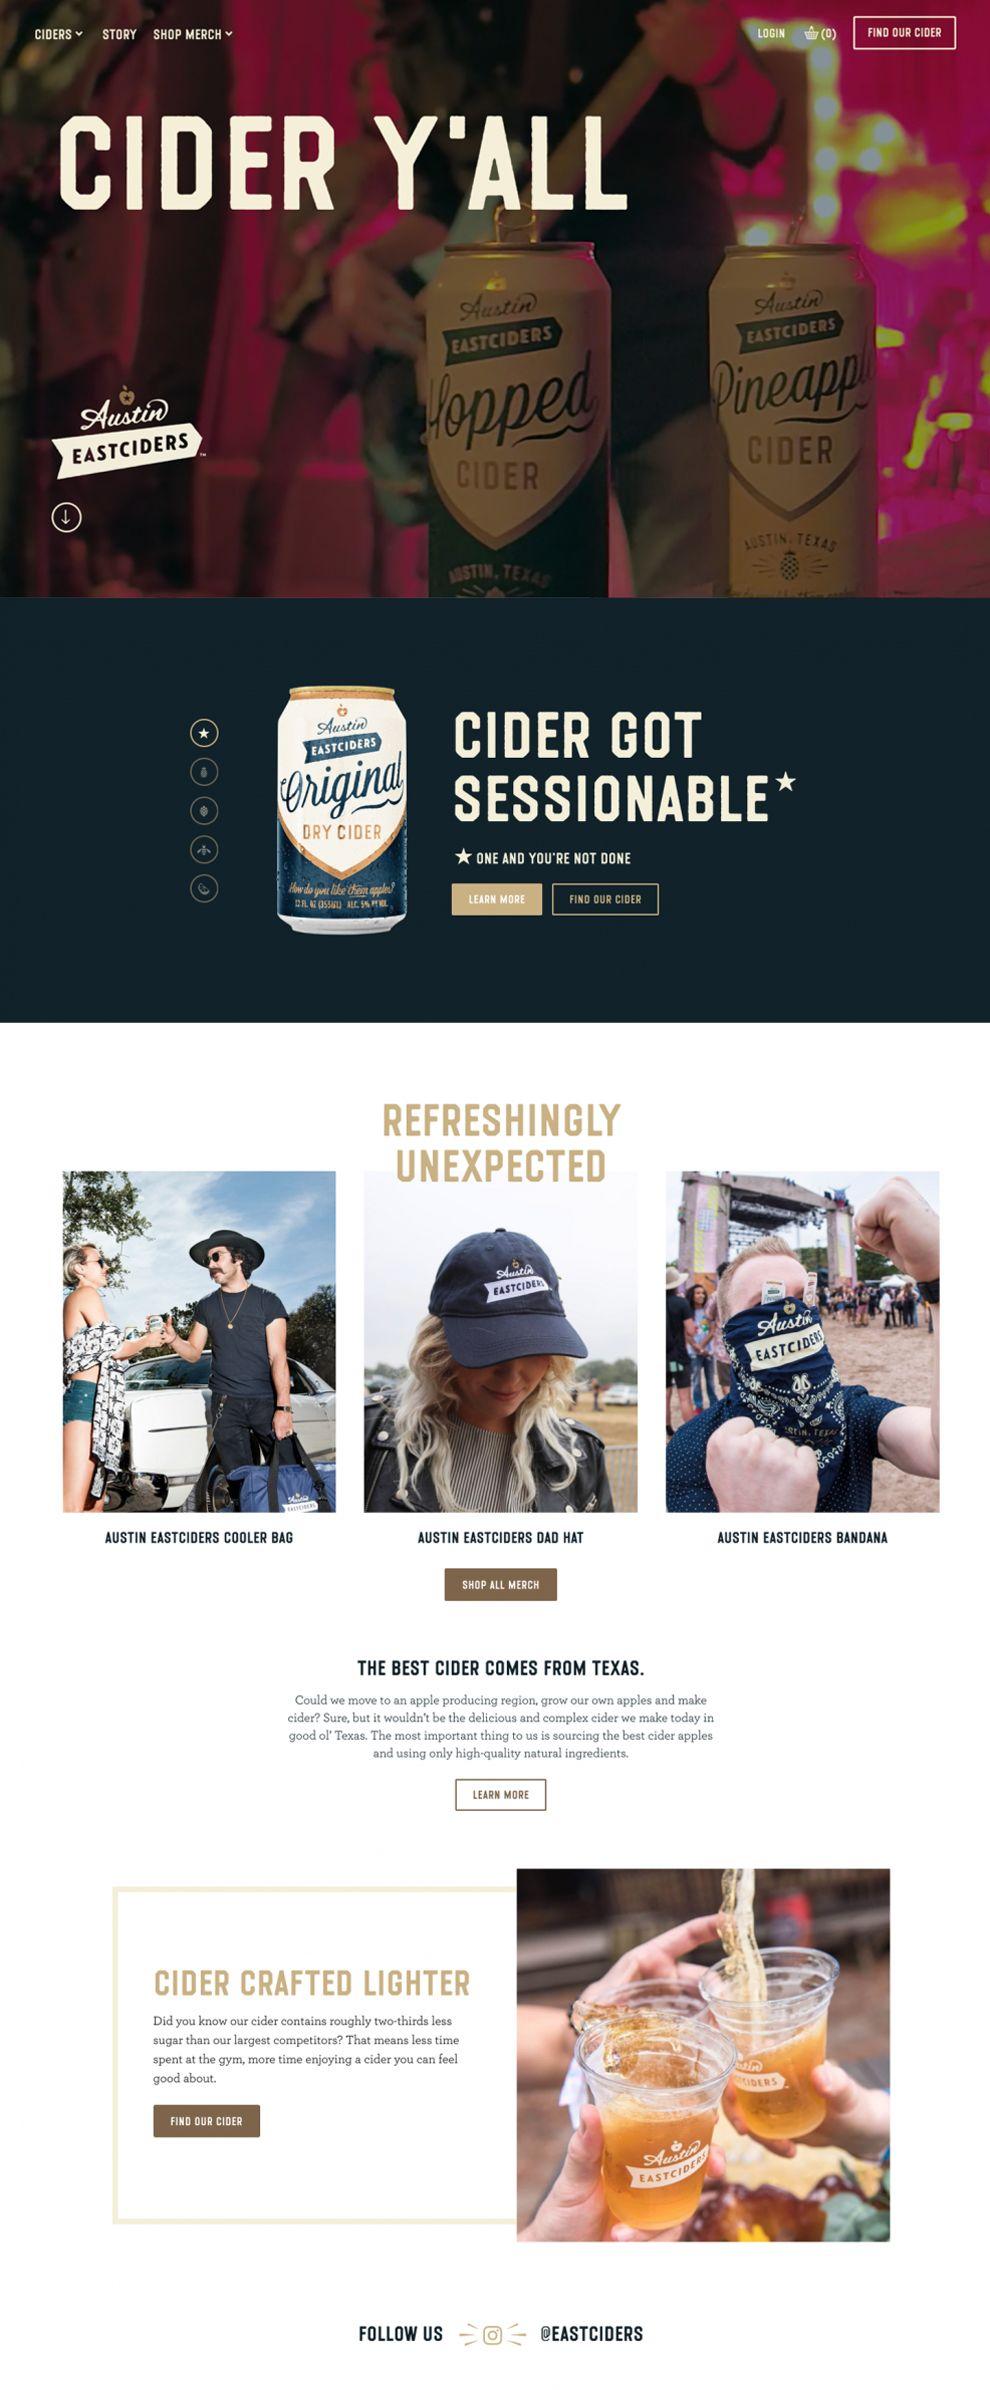 Austin Eastciders Great Website Design